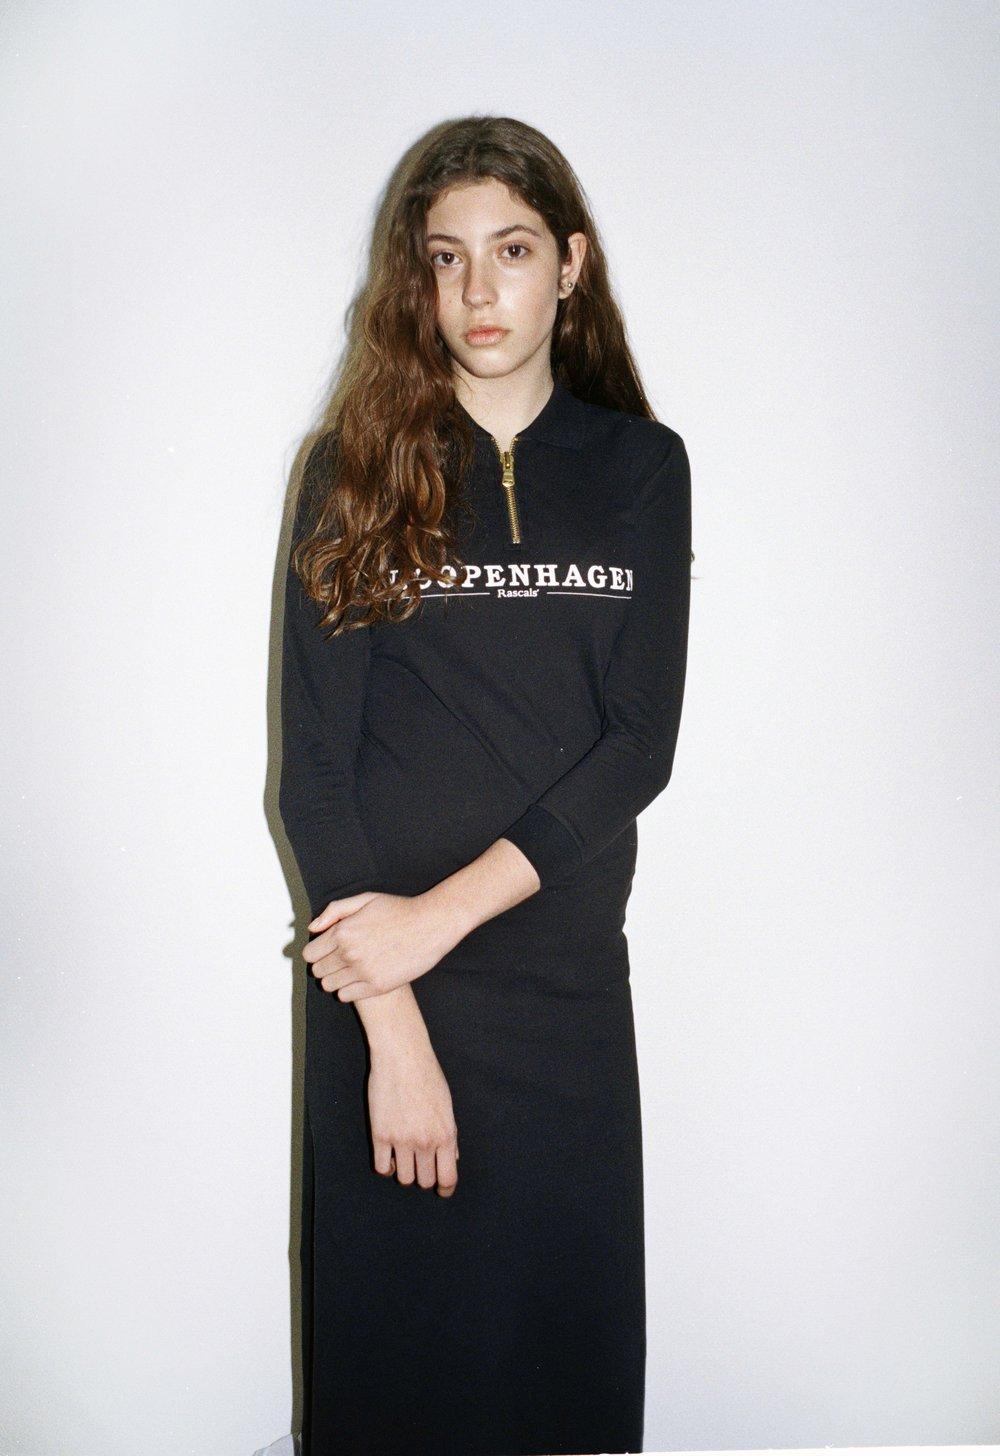 N. Copenhagen Dress.jpg